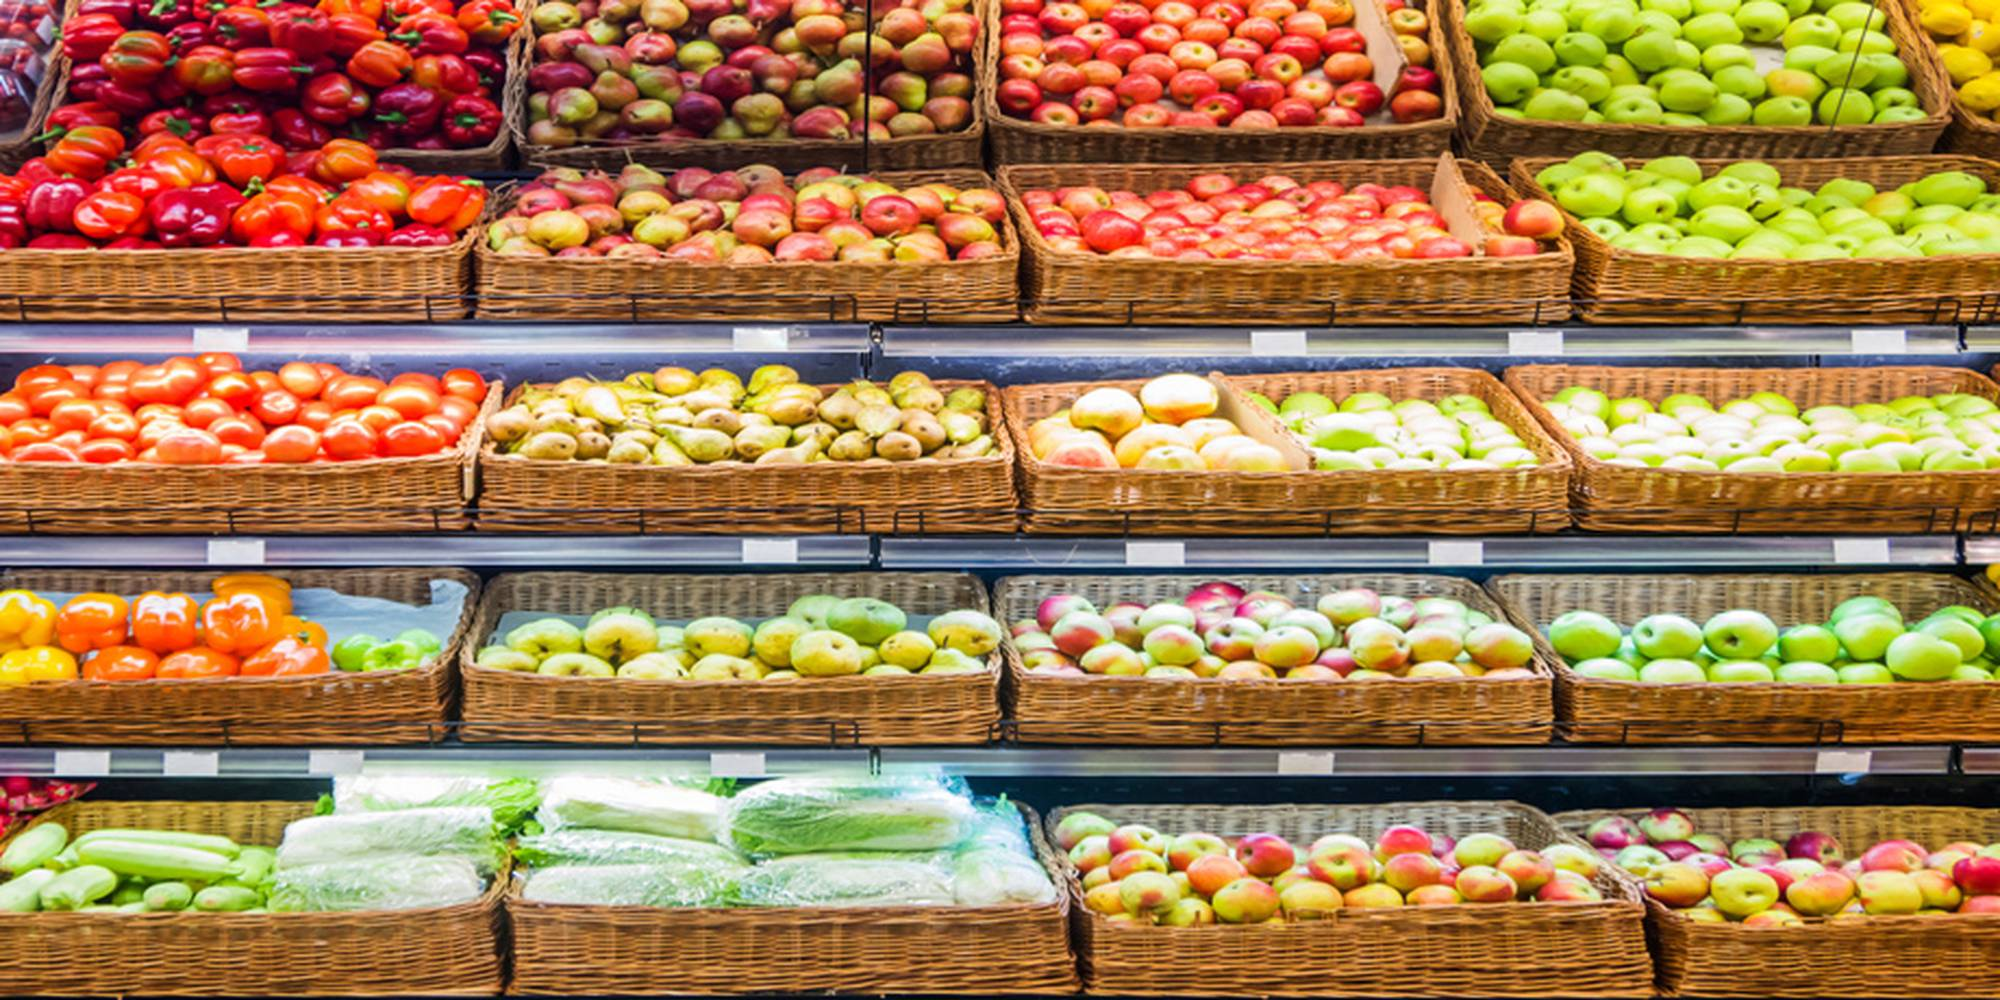 frutta supermercati.jpg